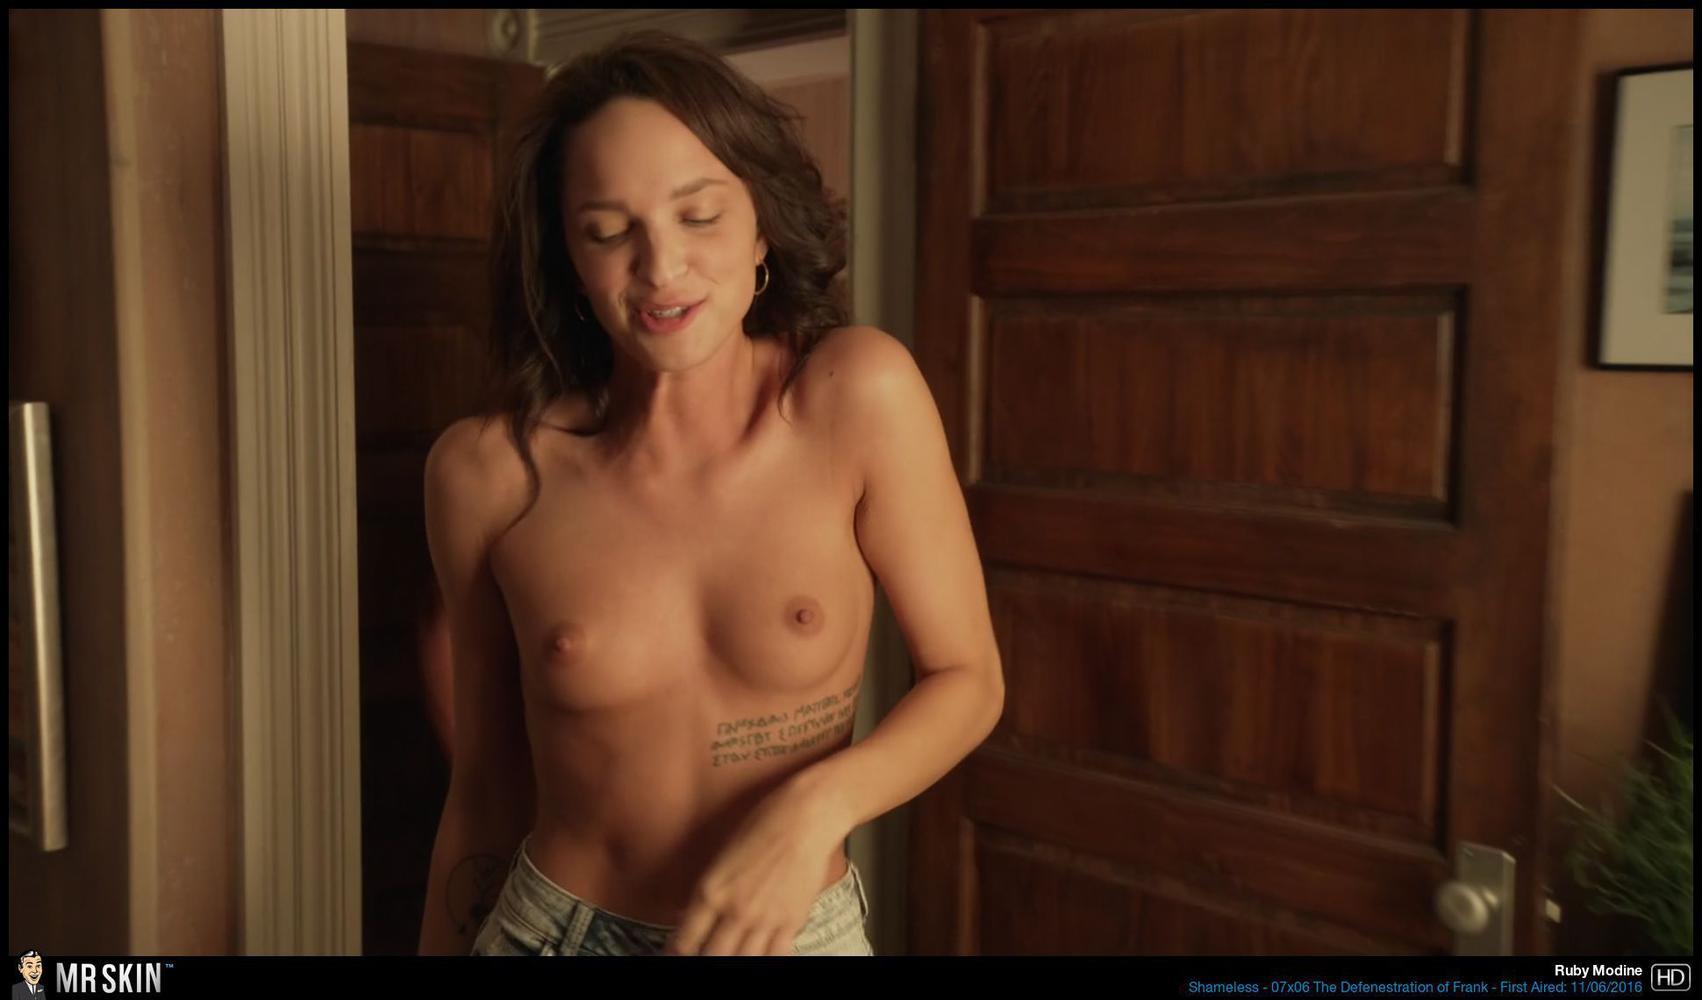 Dexter nude scene compilation yvonne strahovski and others - 1 9